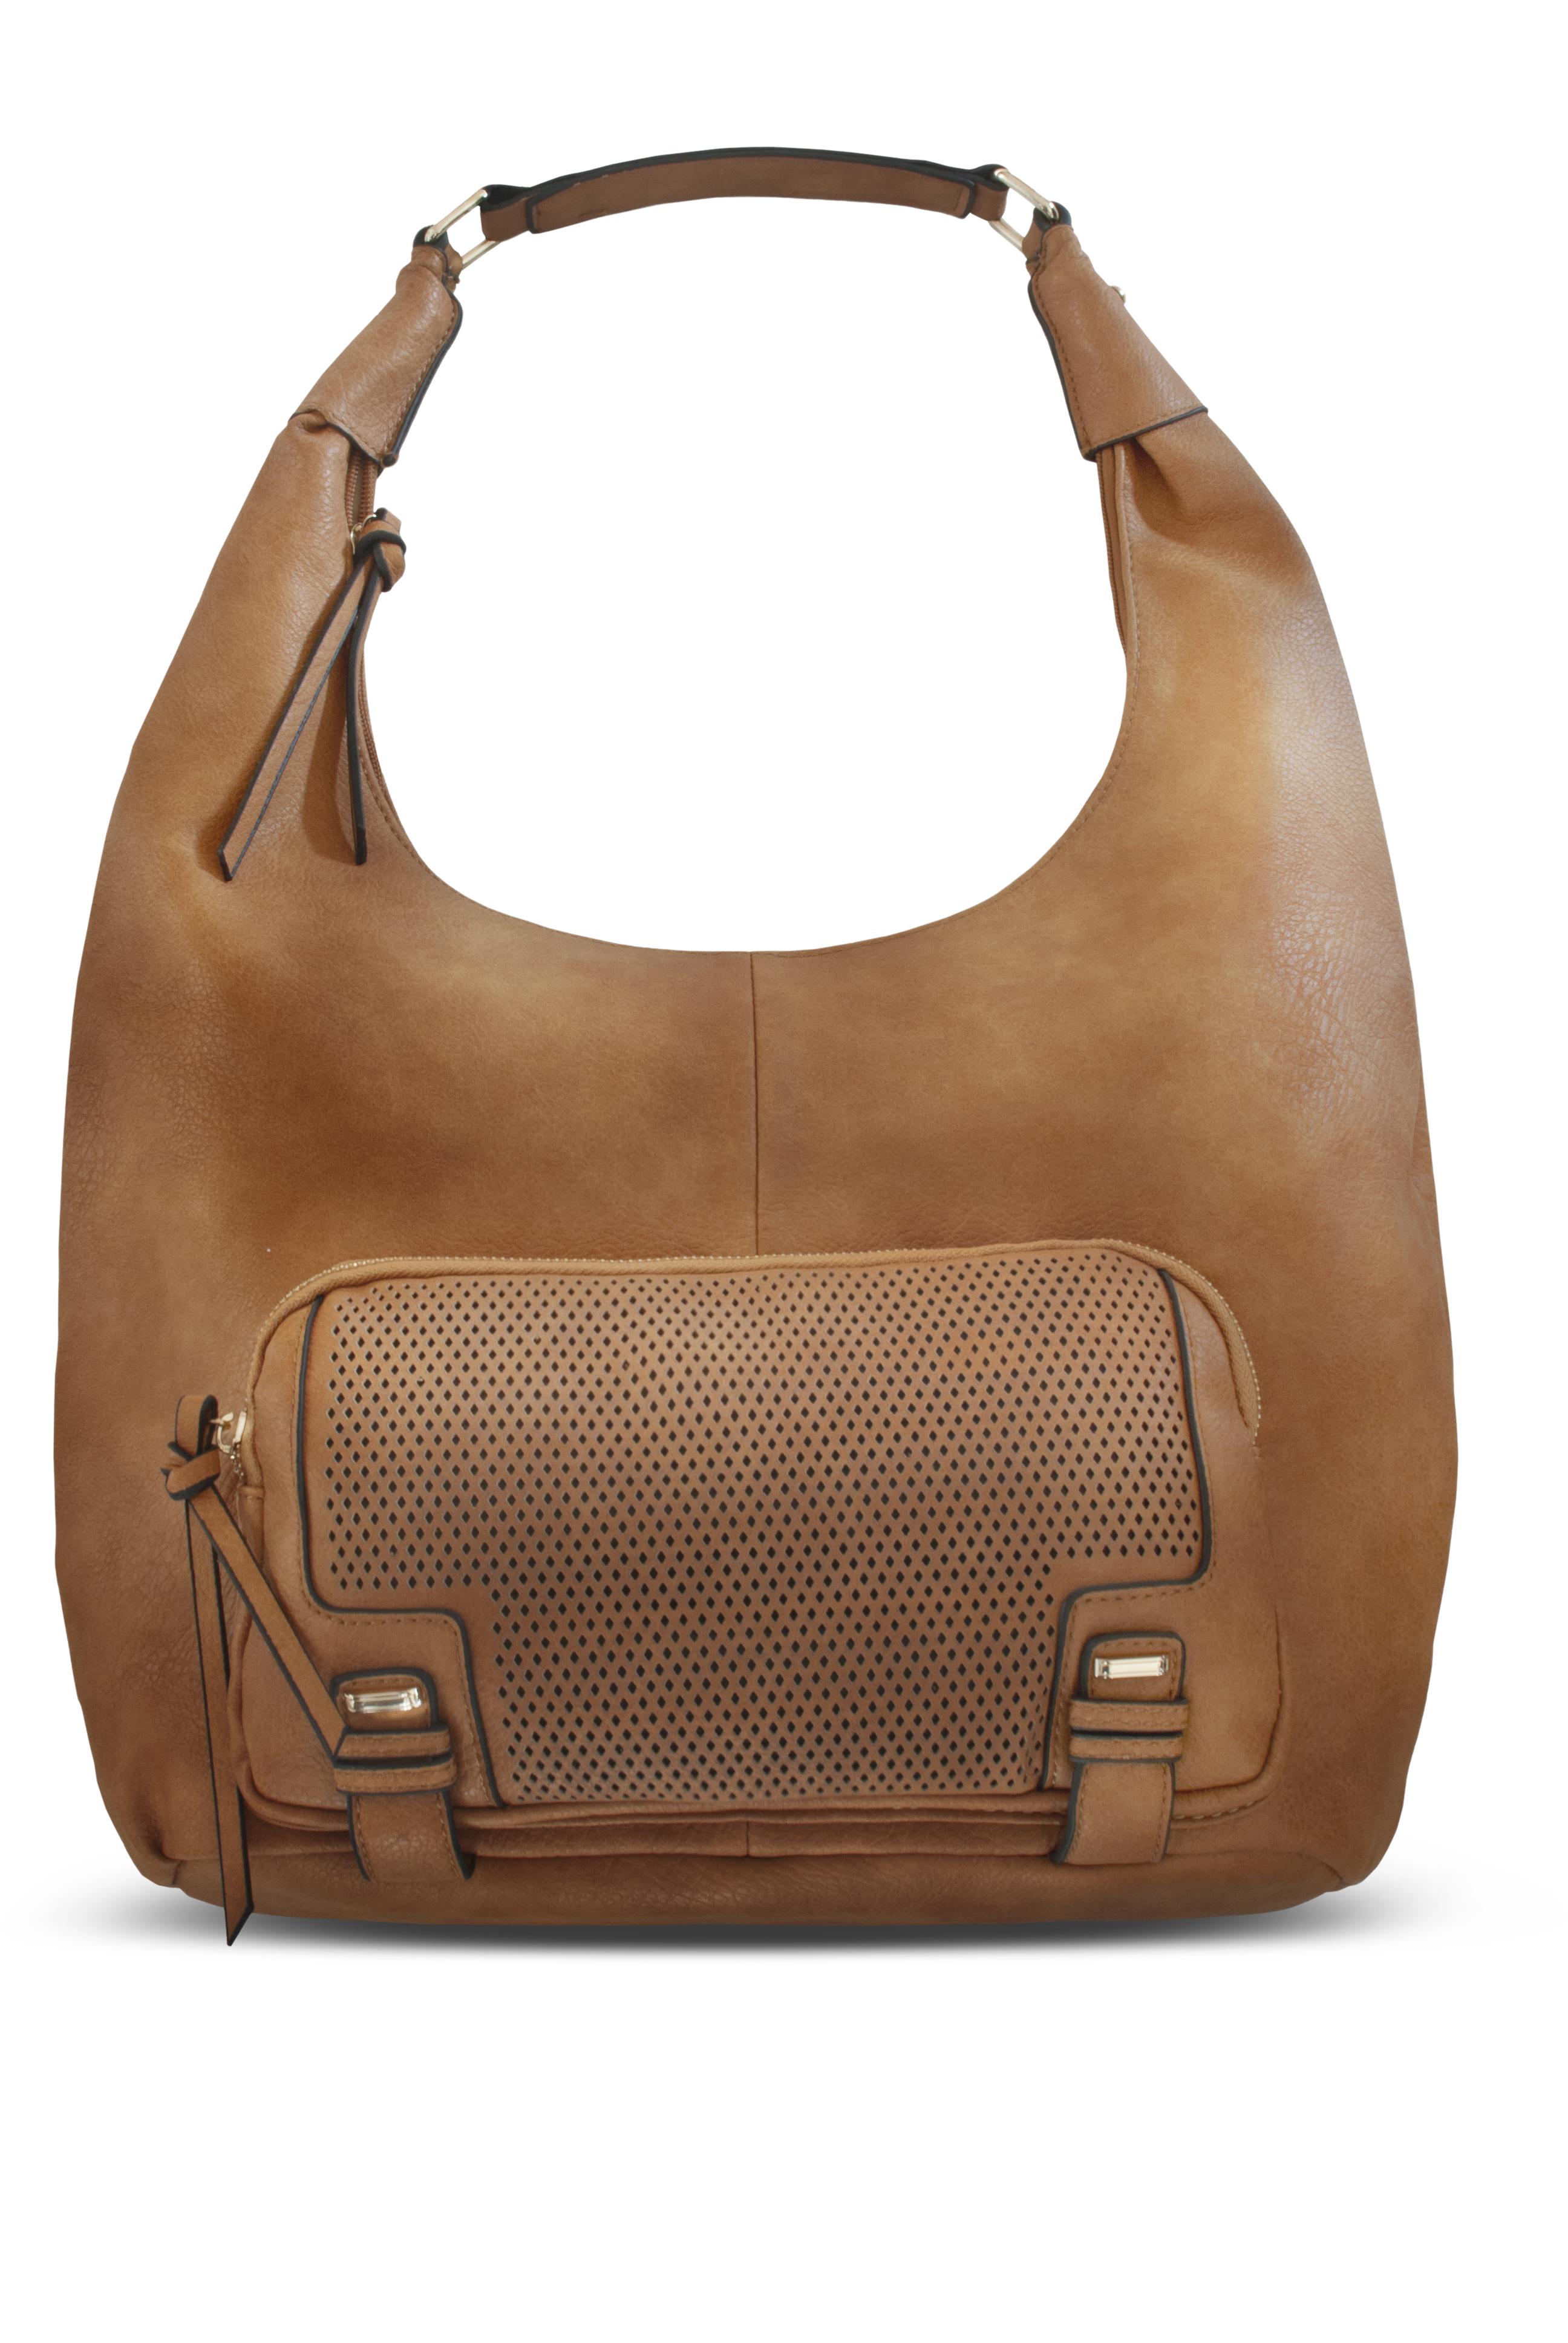 9d8e0c5c33 τσάντα Γυναίκα πορτοφόλι πορτοφόλι τσάντα καφέ δέρμα τσάντα ώμου τσάντα  hobo προϊόν αξεσουάρ μόδας χρώμα καραμέλας